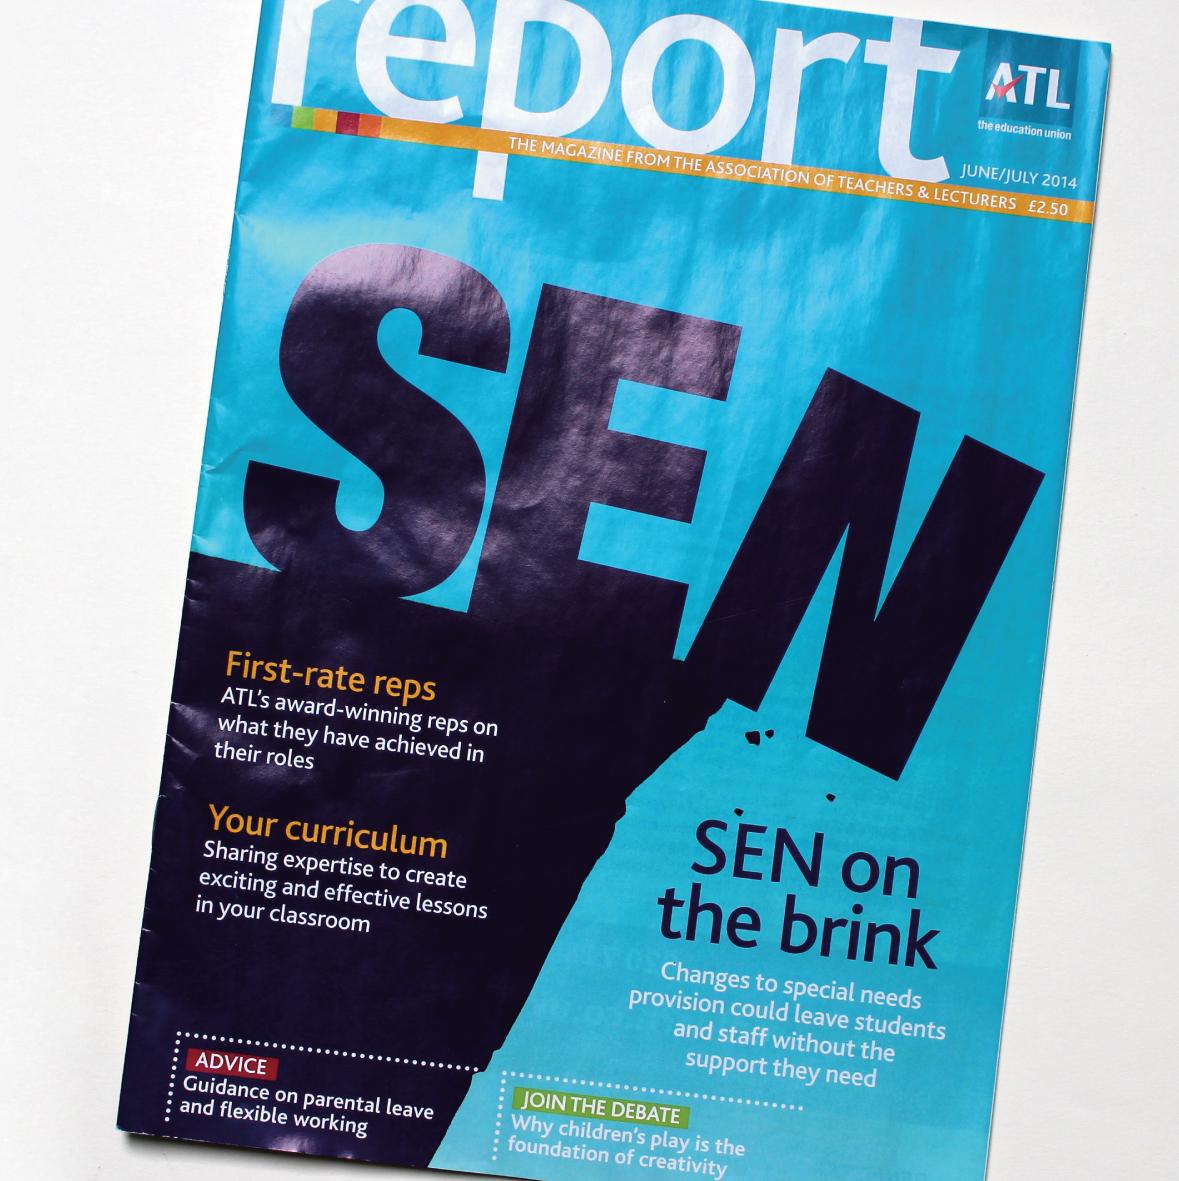 Join The Debate,ATL Report Magazine June/July 2014